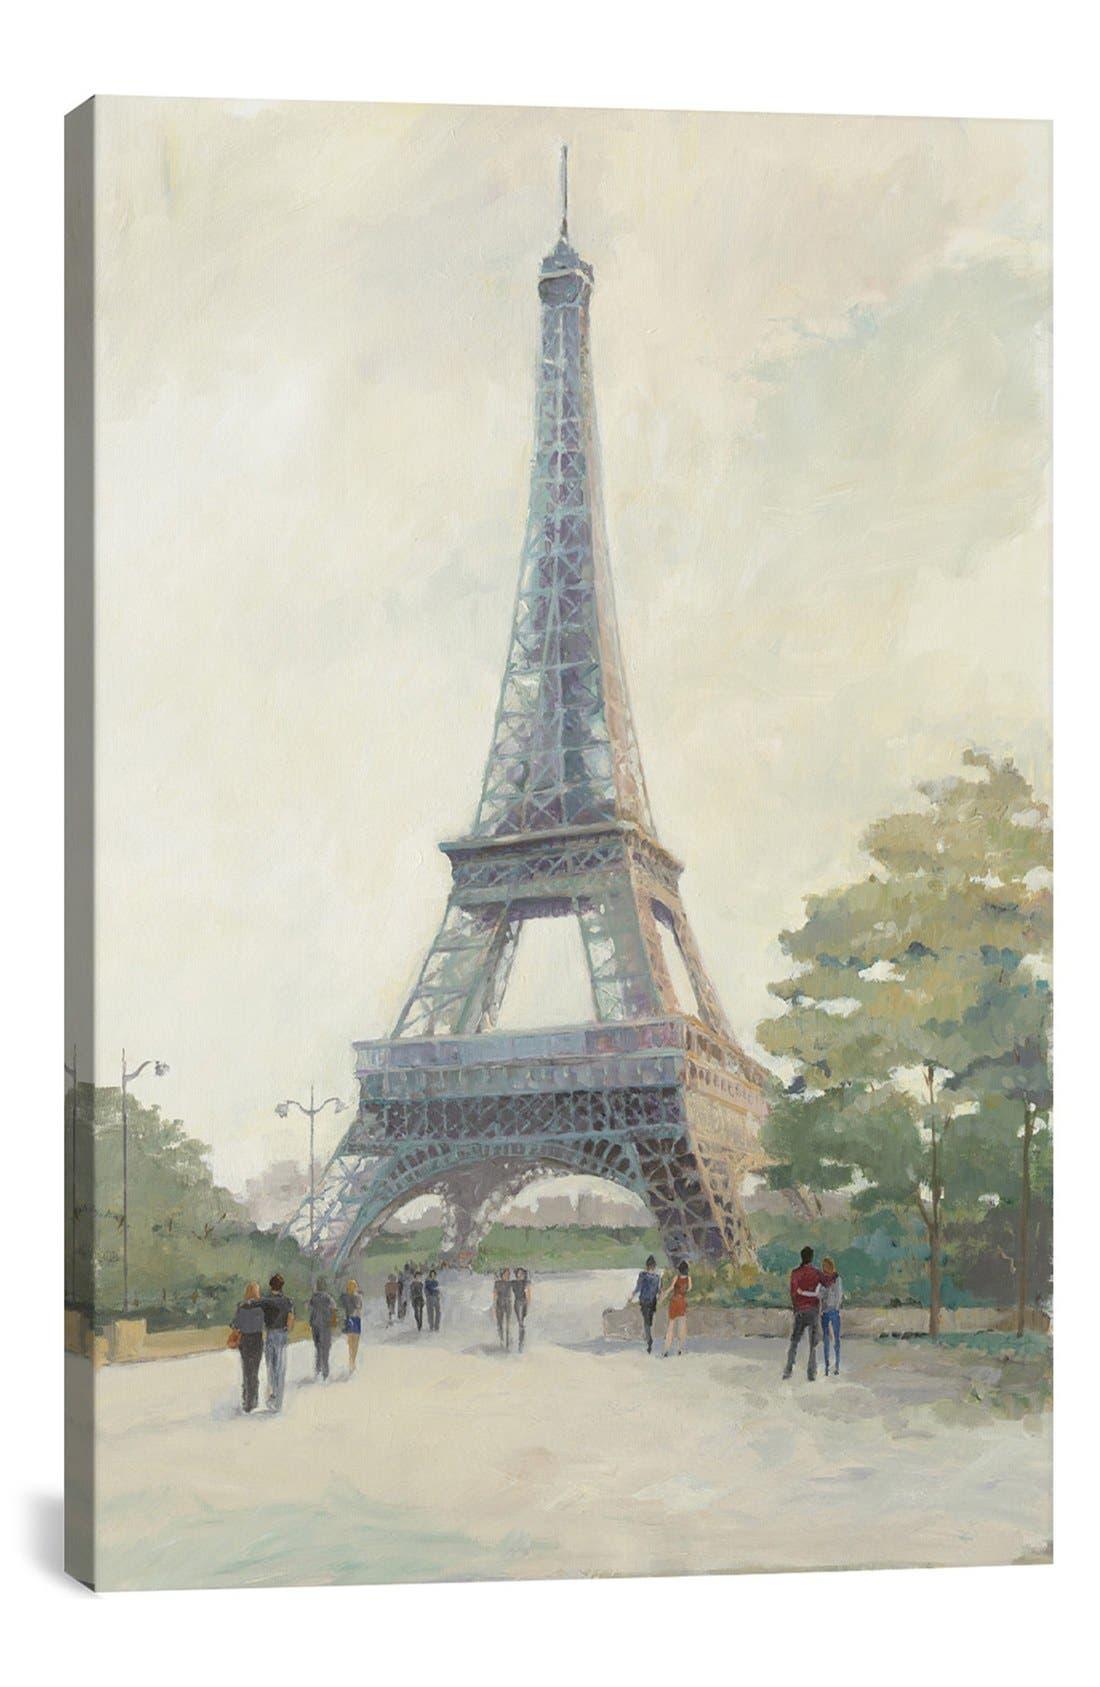 Alternate Image 1 Selected - iCanvas 'Evening in Paris - Eiffel Tower' Giclée Print Canvas Art